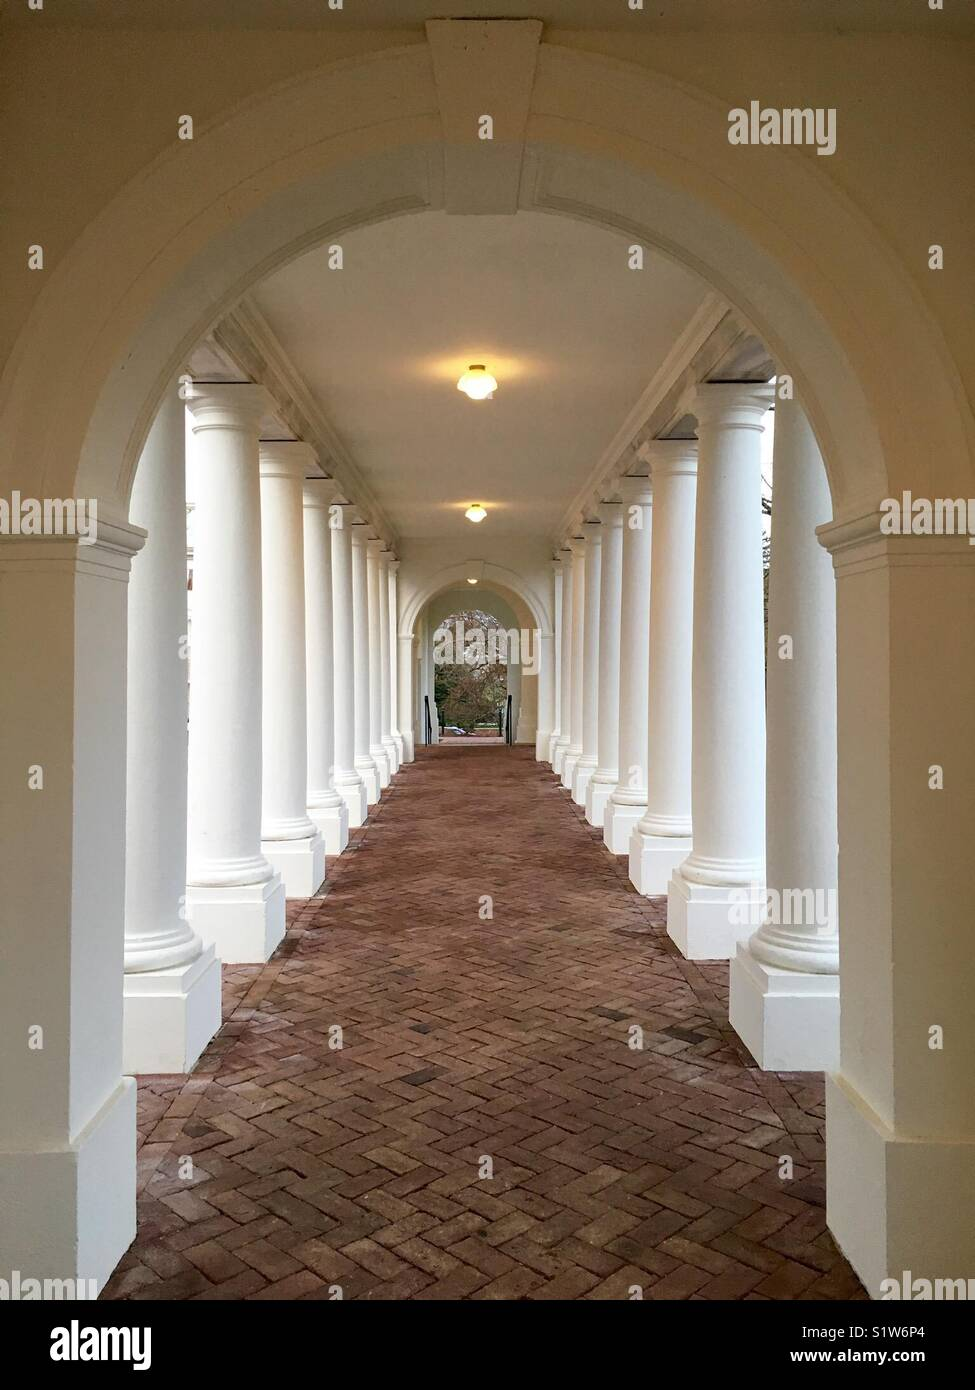 UVA colonnade - Stock Image